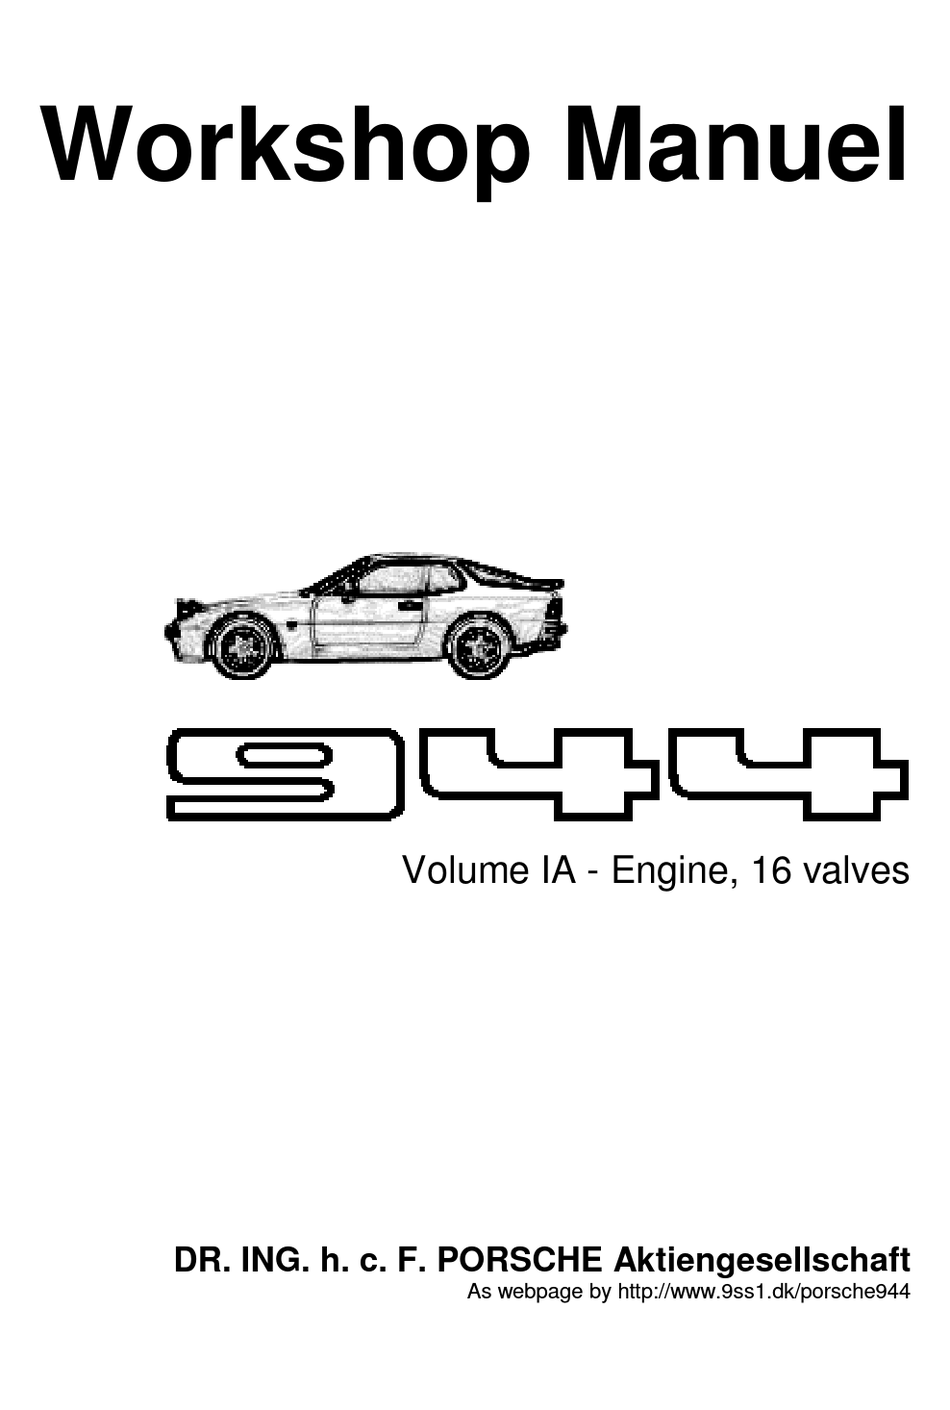 Porsche 944 Workshop Manual Pdf Download Manualslib